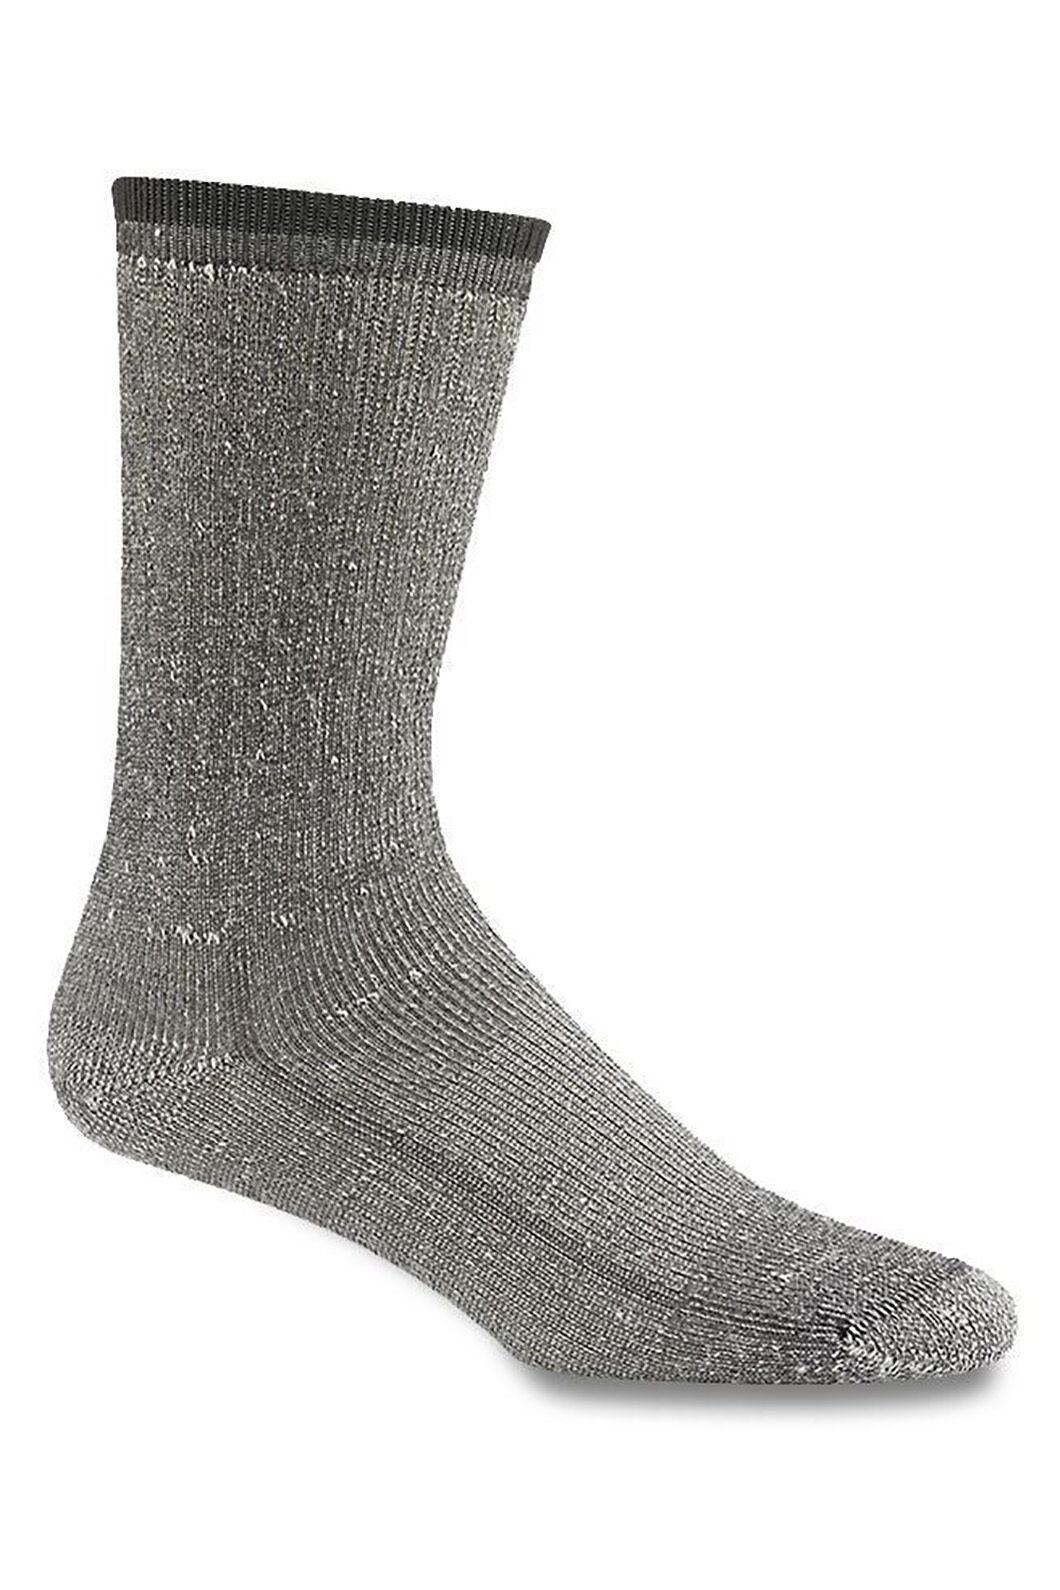 Wigwam Unisex Merino Comfort Hike Socks, Charcoal, hi-res